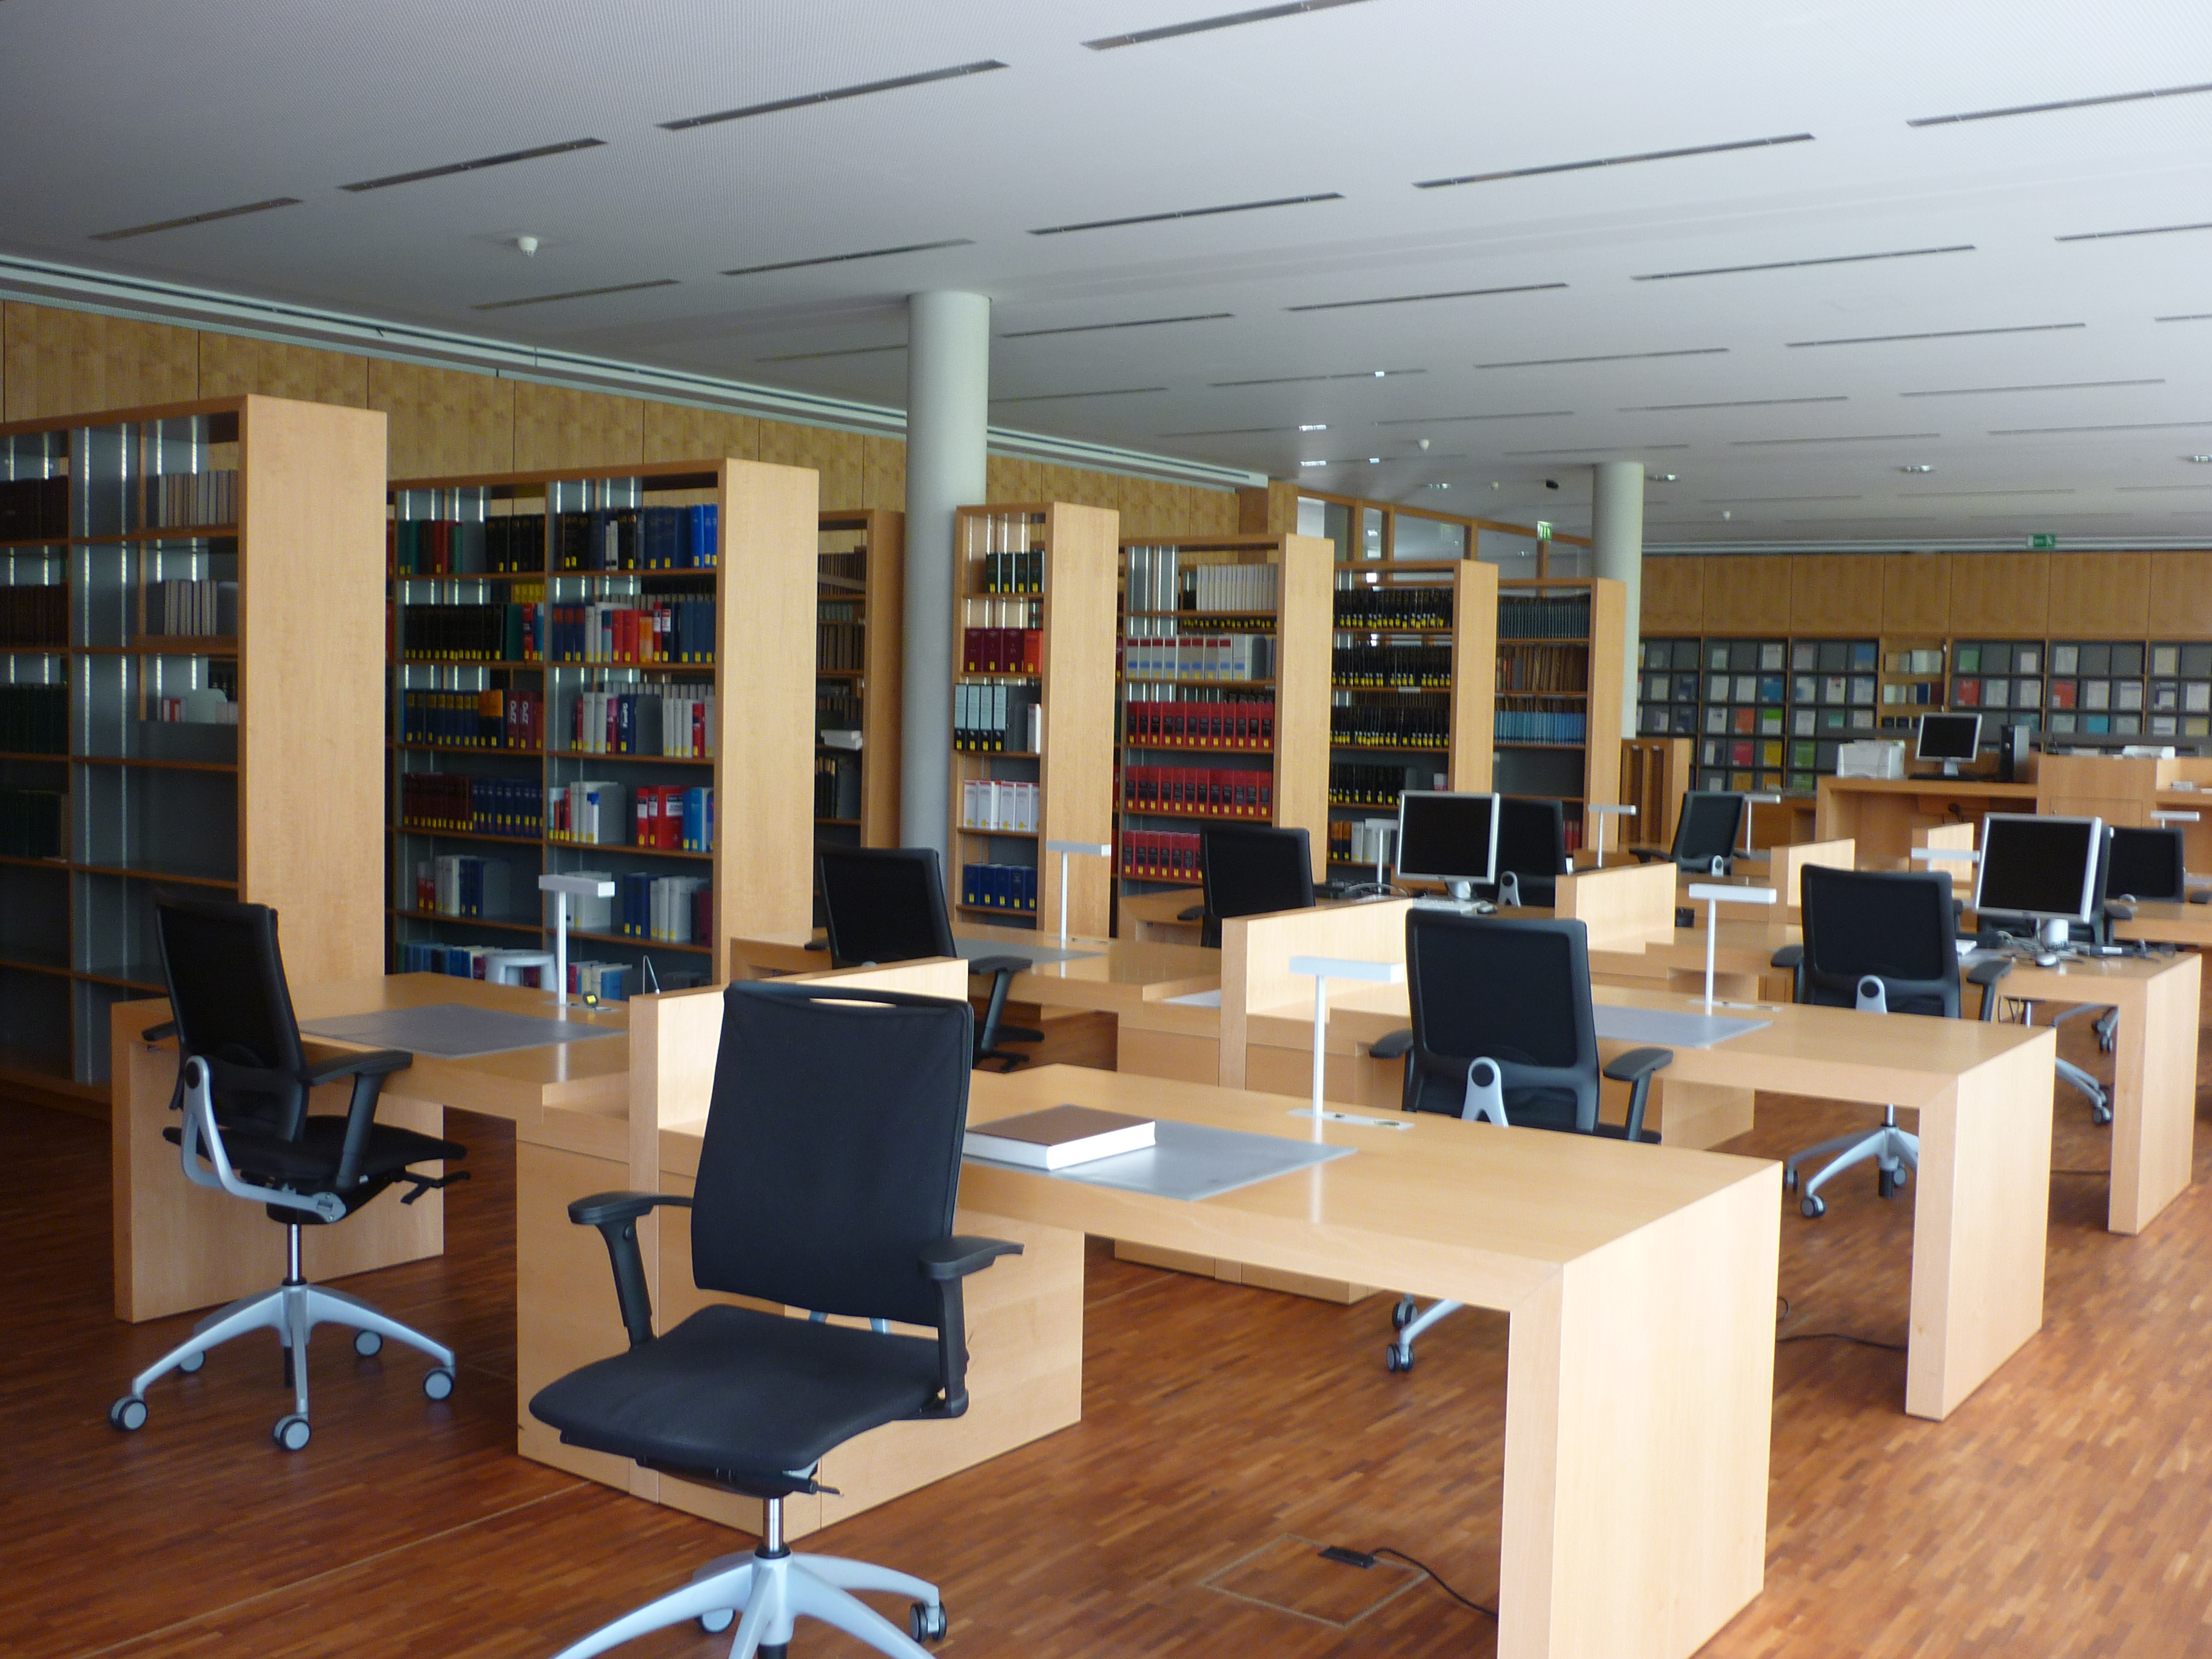 BGH - Bibliothek - Lesesaal.JPG